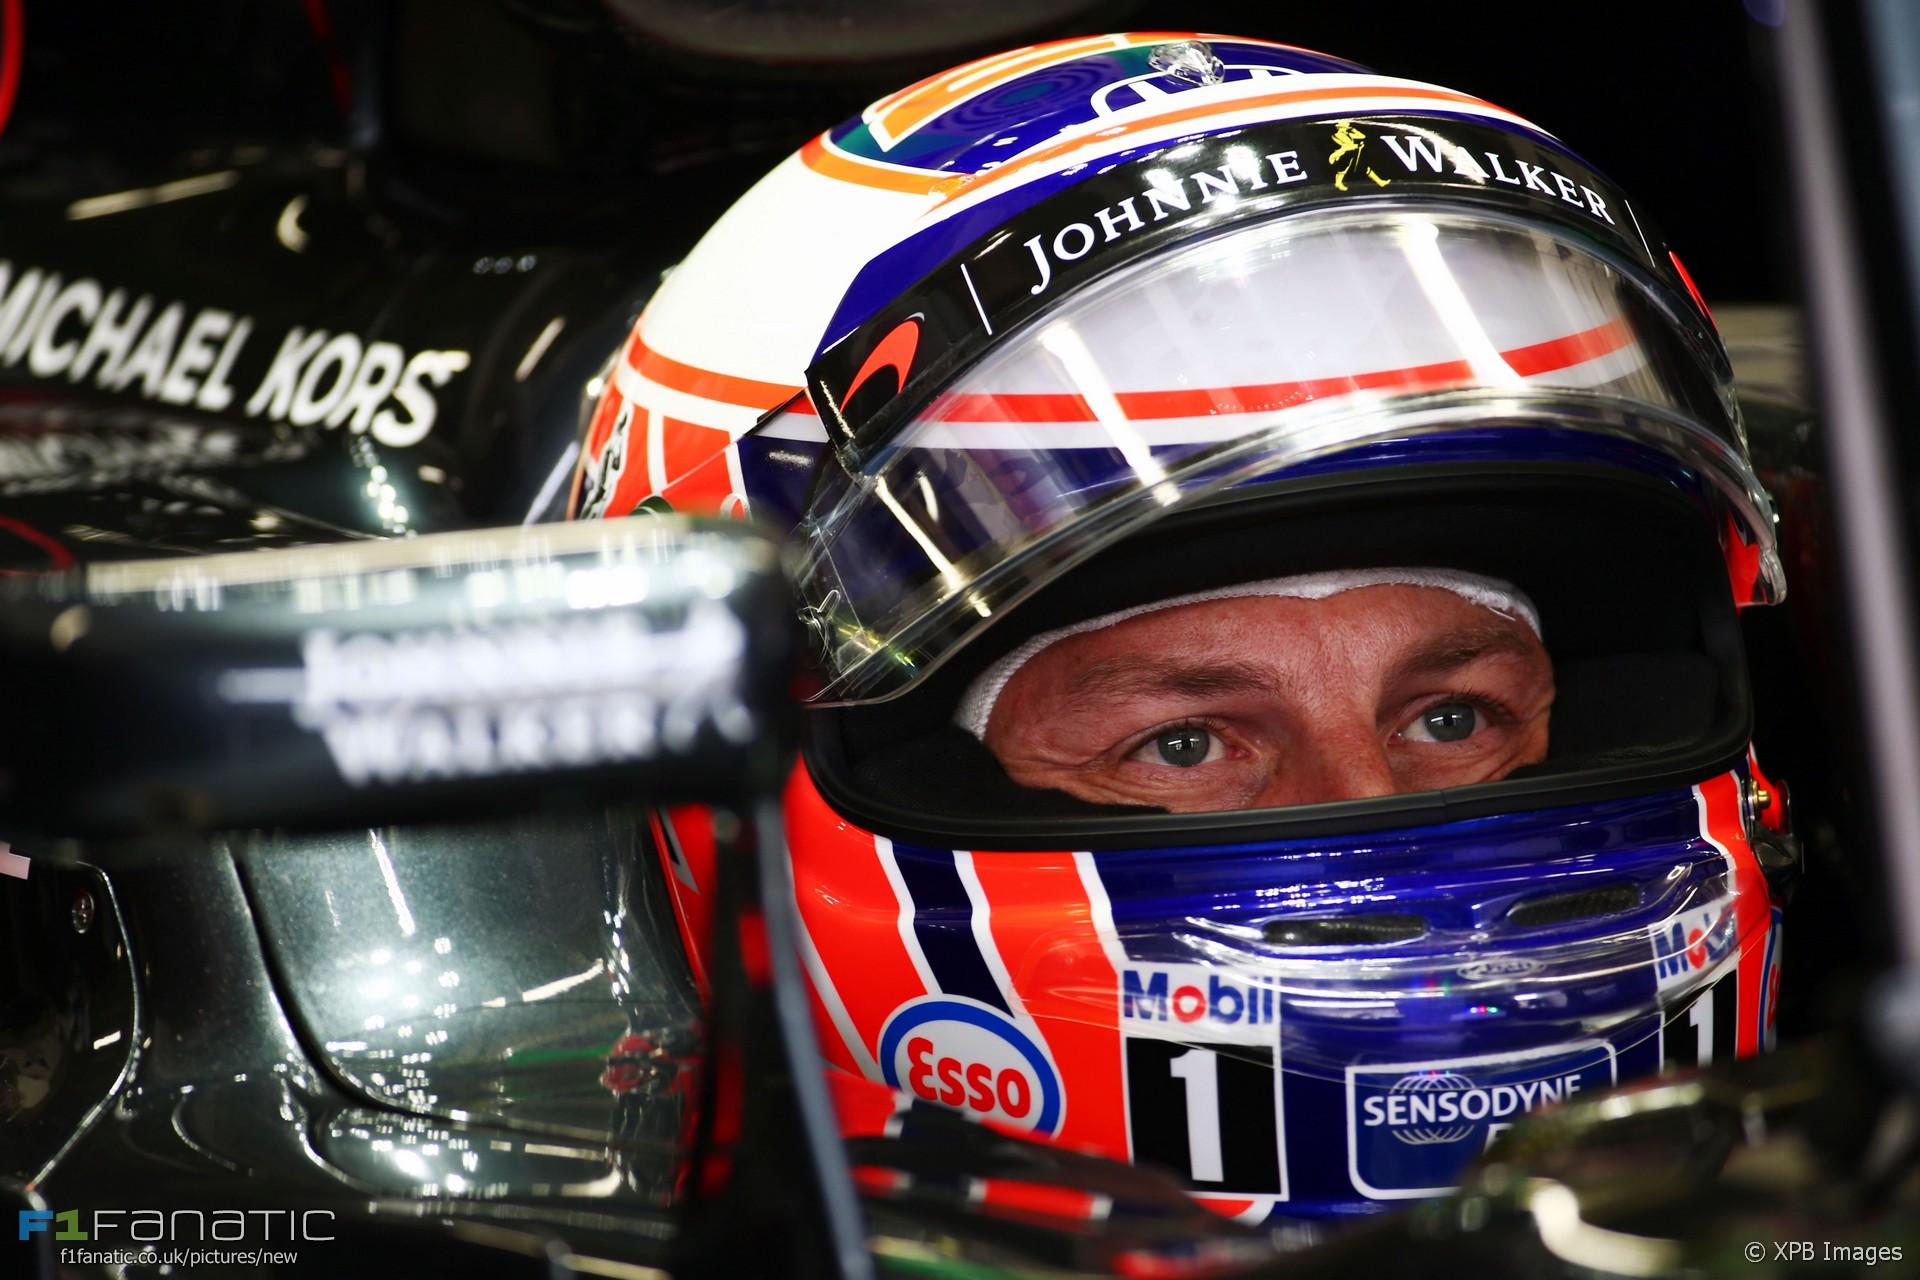 Jenson Button, McLaren, Interlagos, 2016